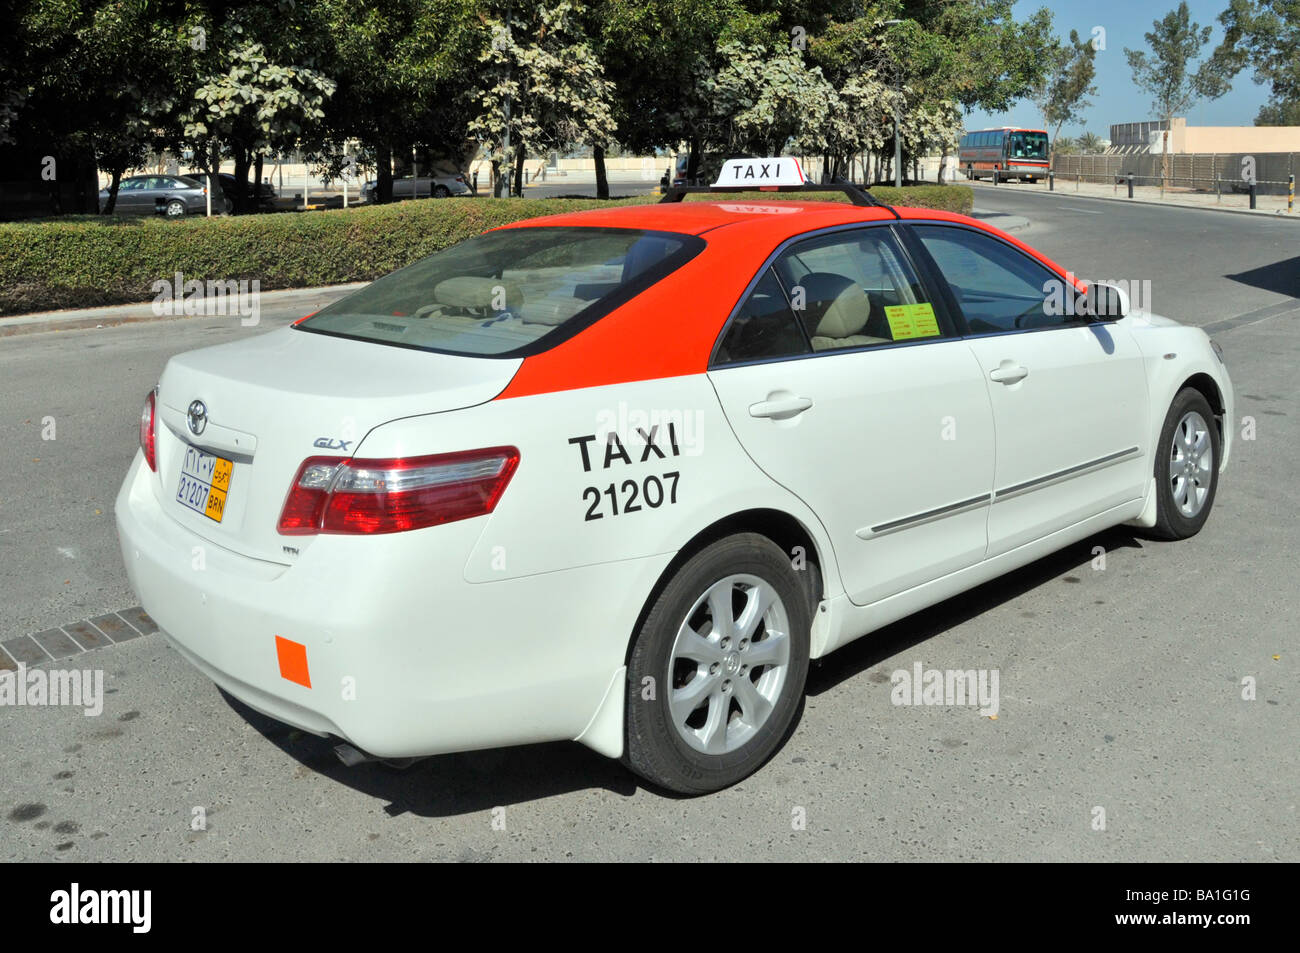 Bahrain taxi cab Stock Photo